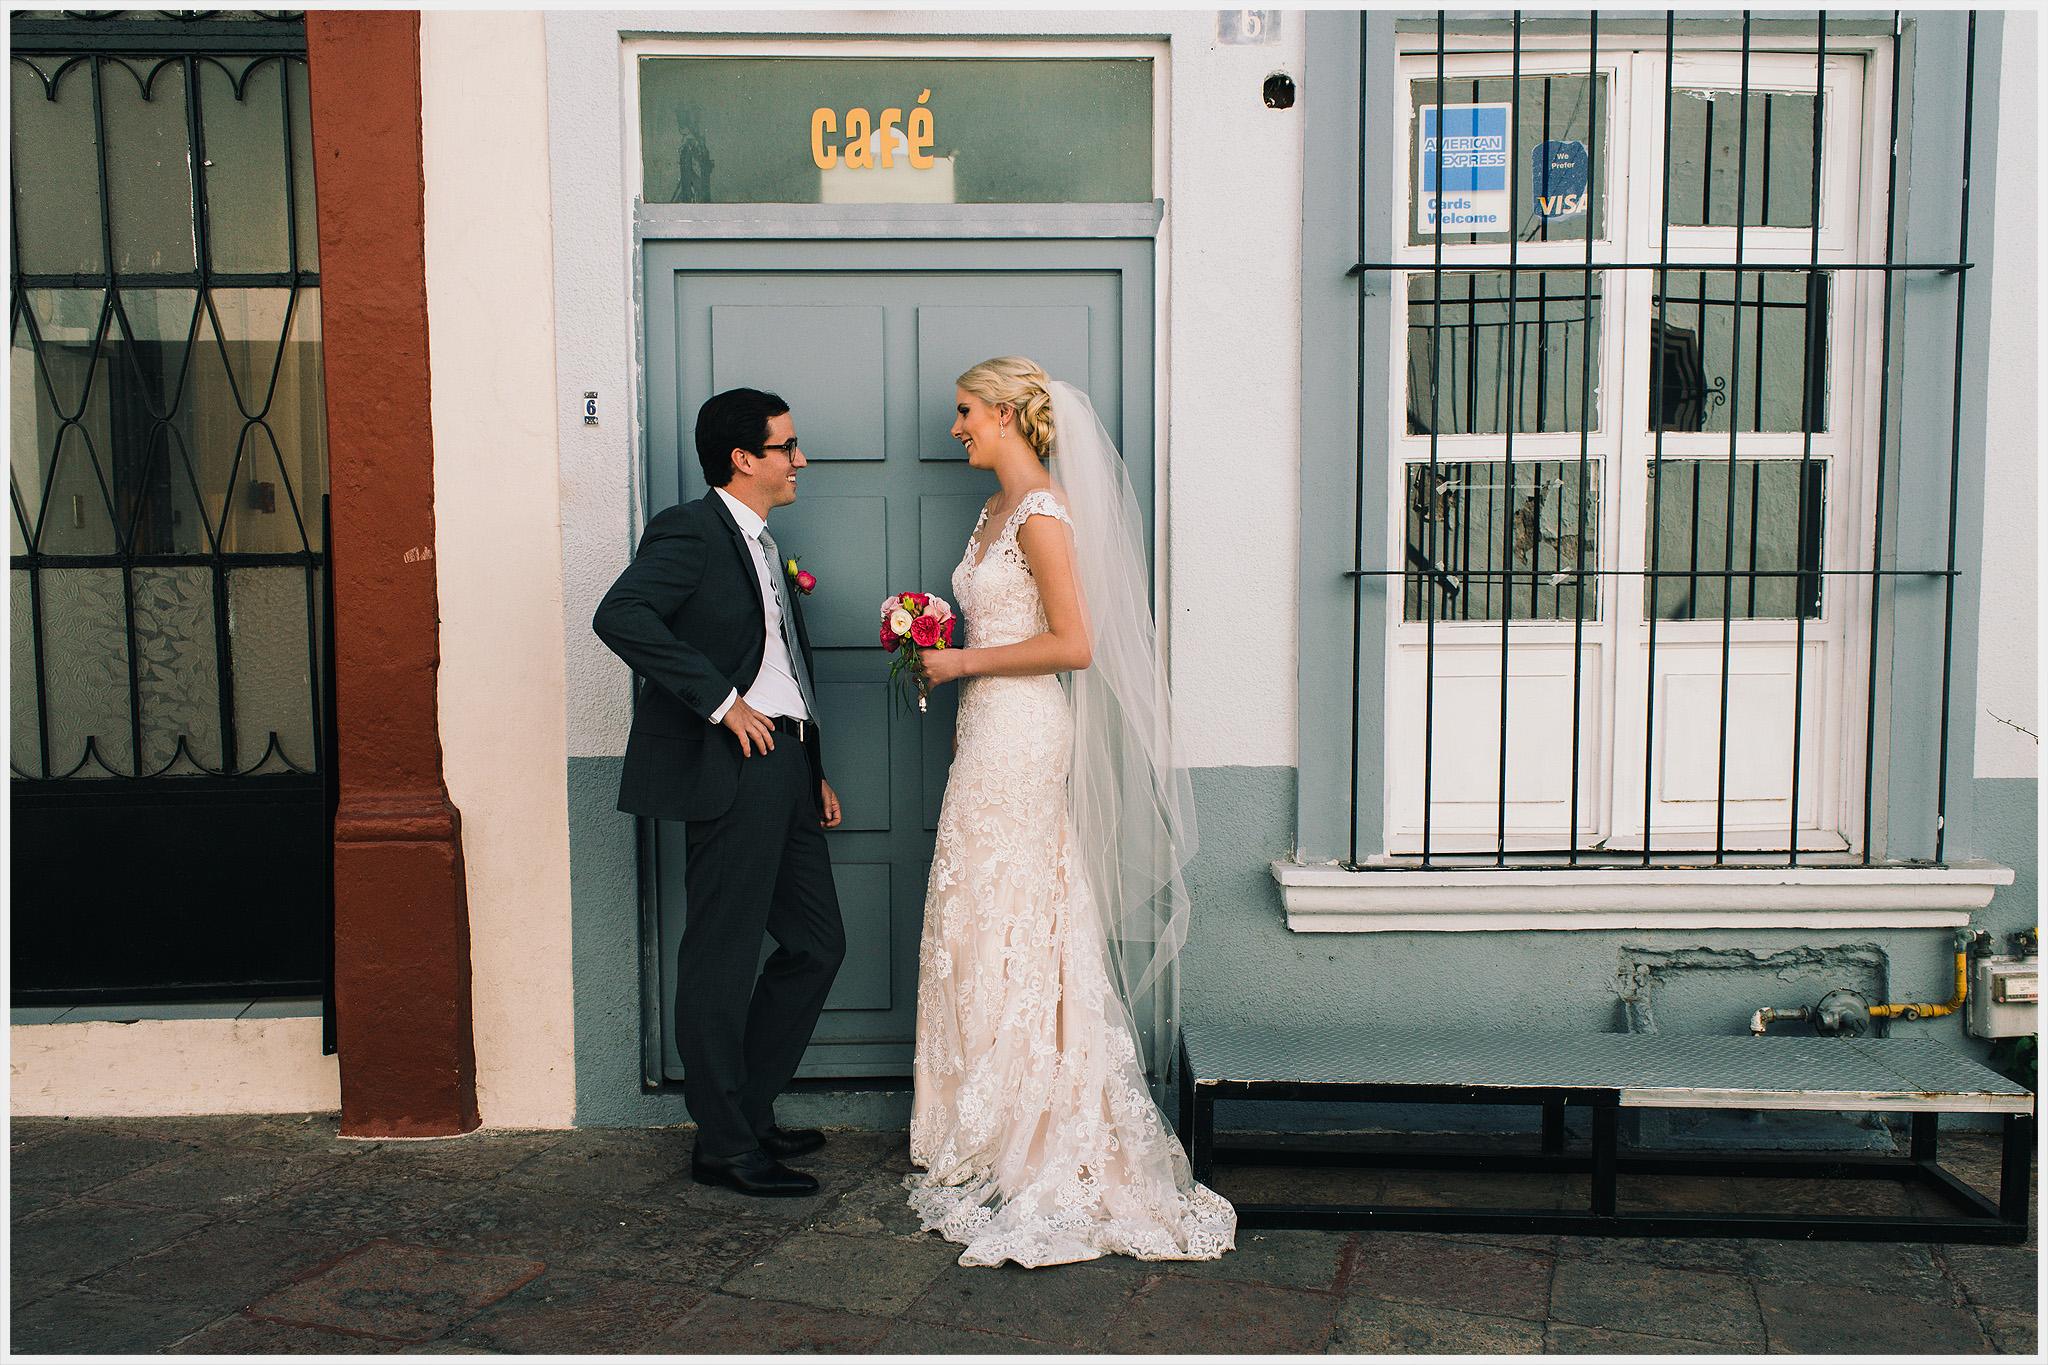 martin muriel mexico wedding_25.jpg